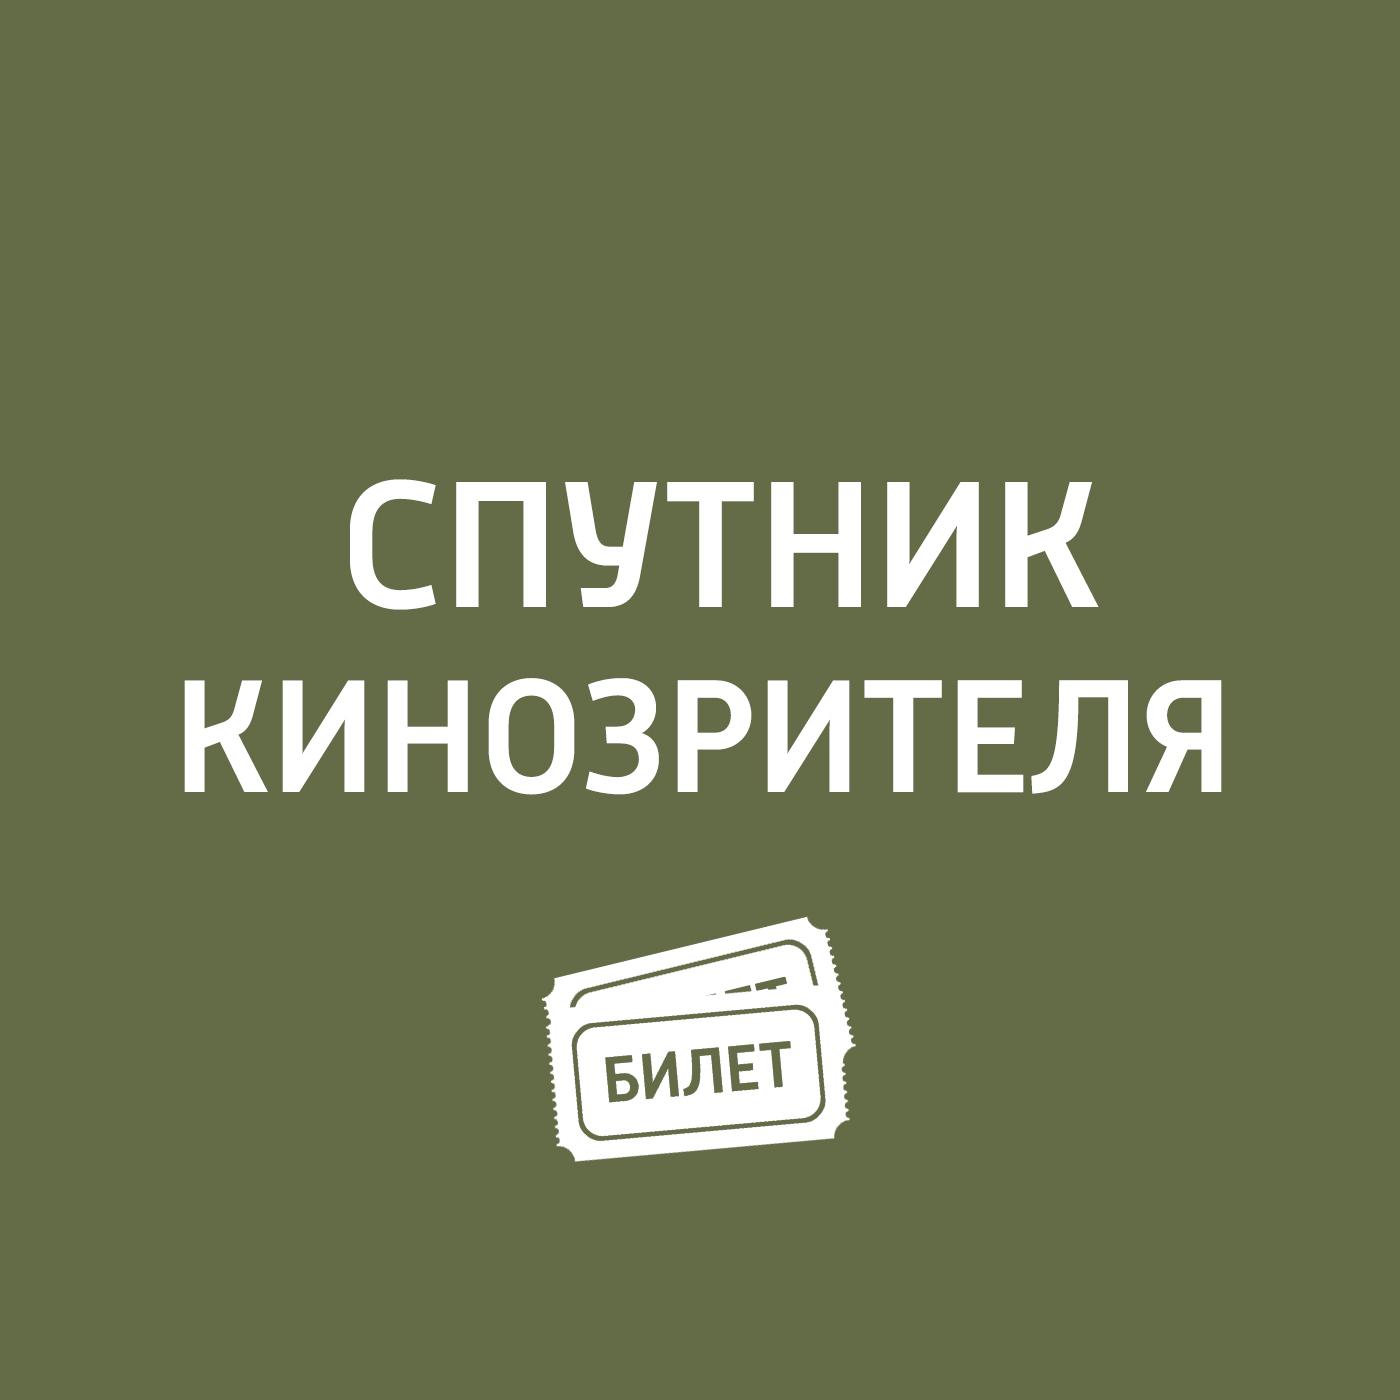 Антон Долин Евгений Евстигнеев